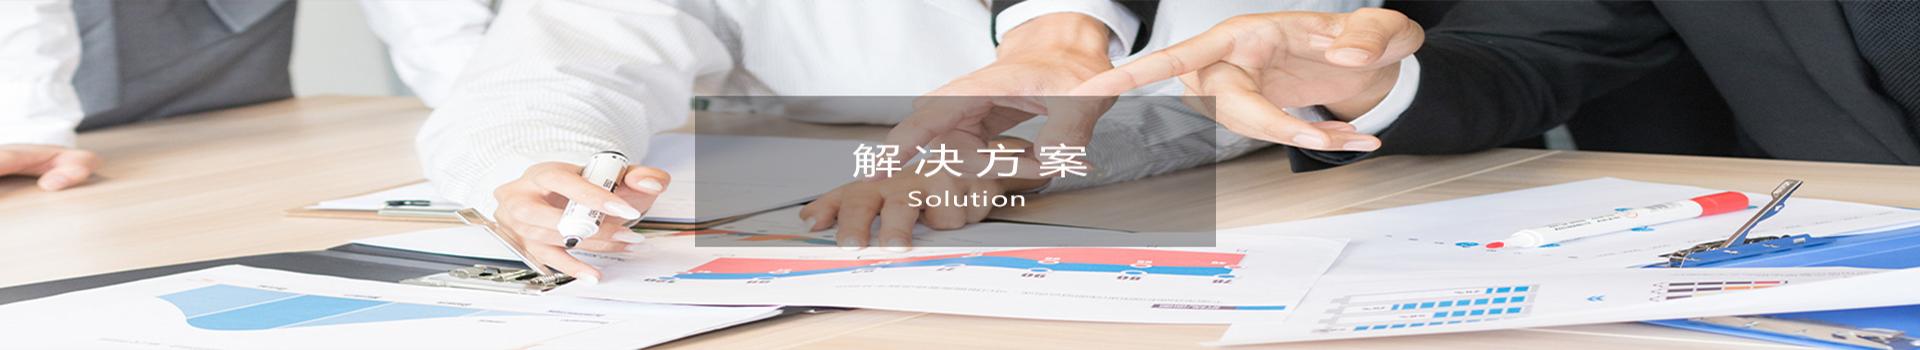 http://www.ecostonepanels.com/data/upload/201910/20191009174347_732.jpg